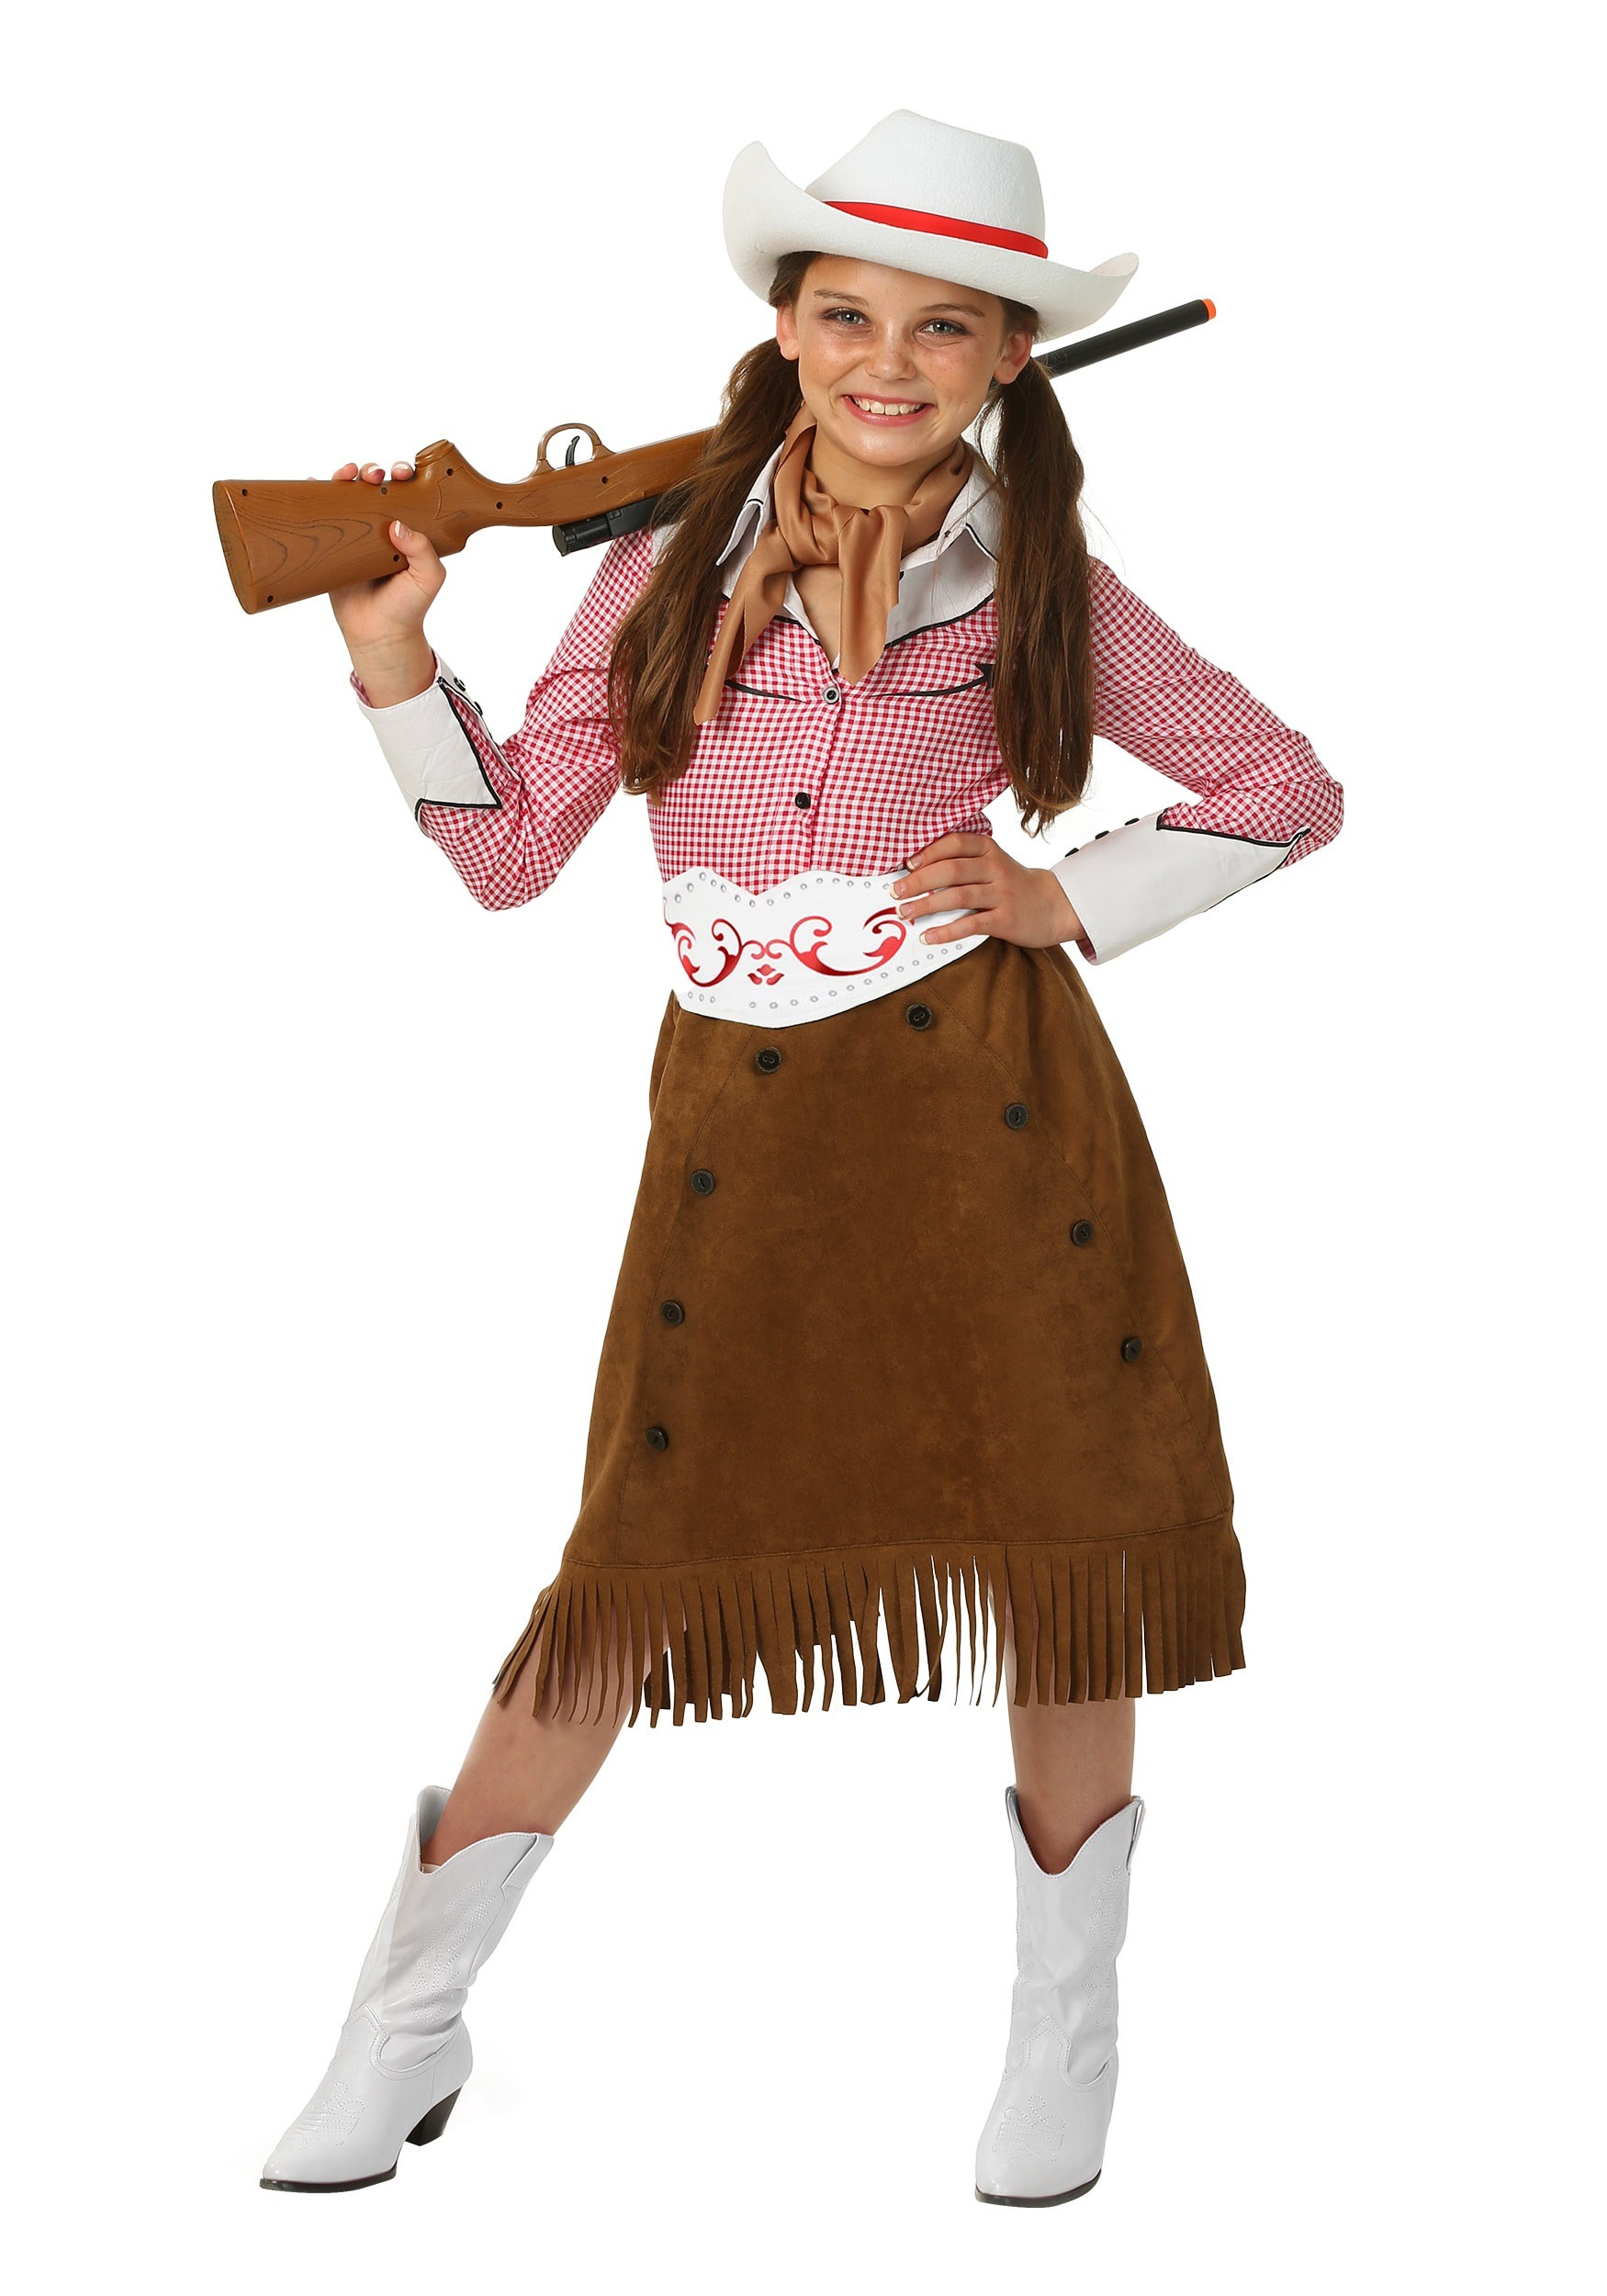 girls-rodeo-cowgirl-costume.jpg&f=1&nofb